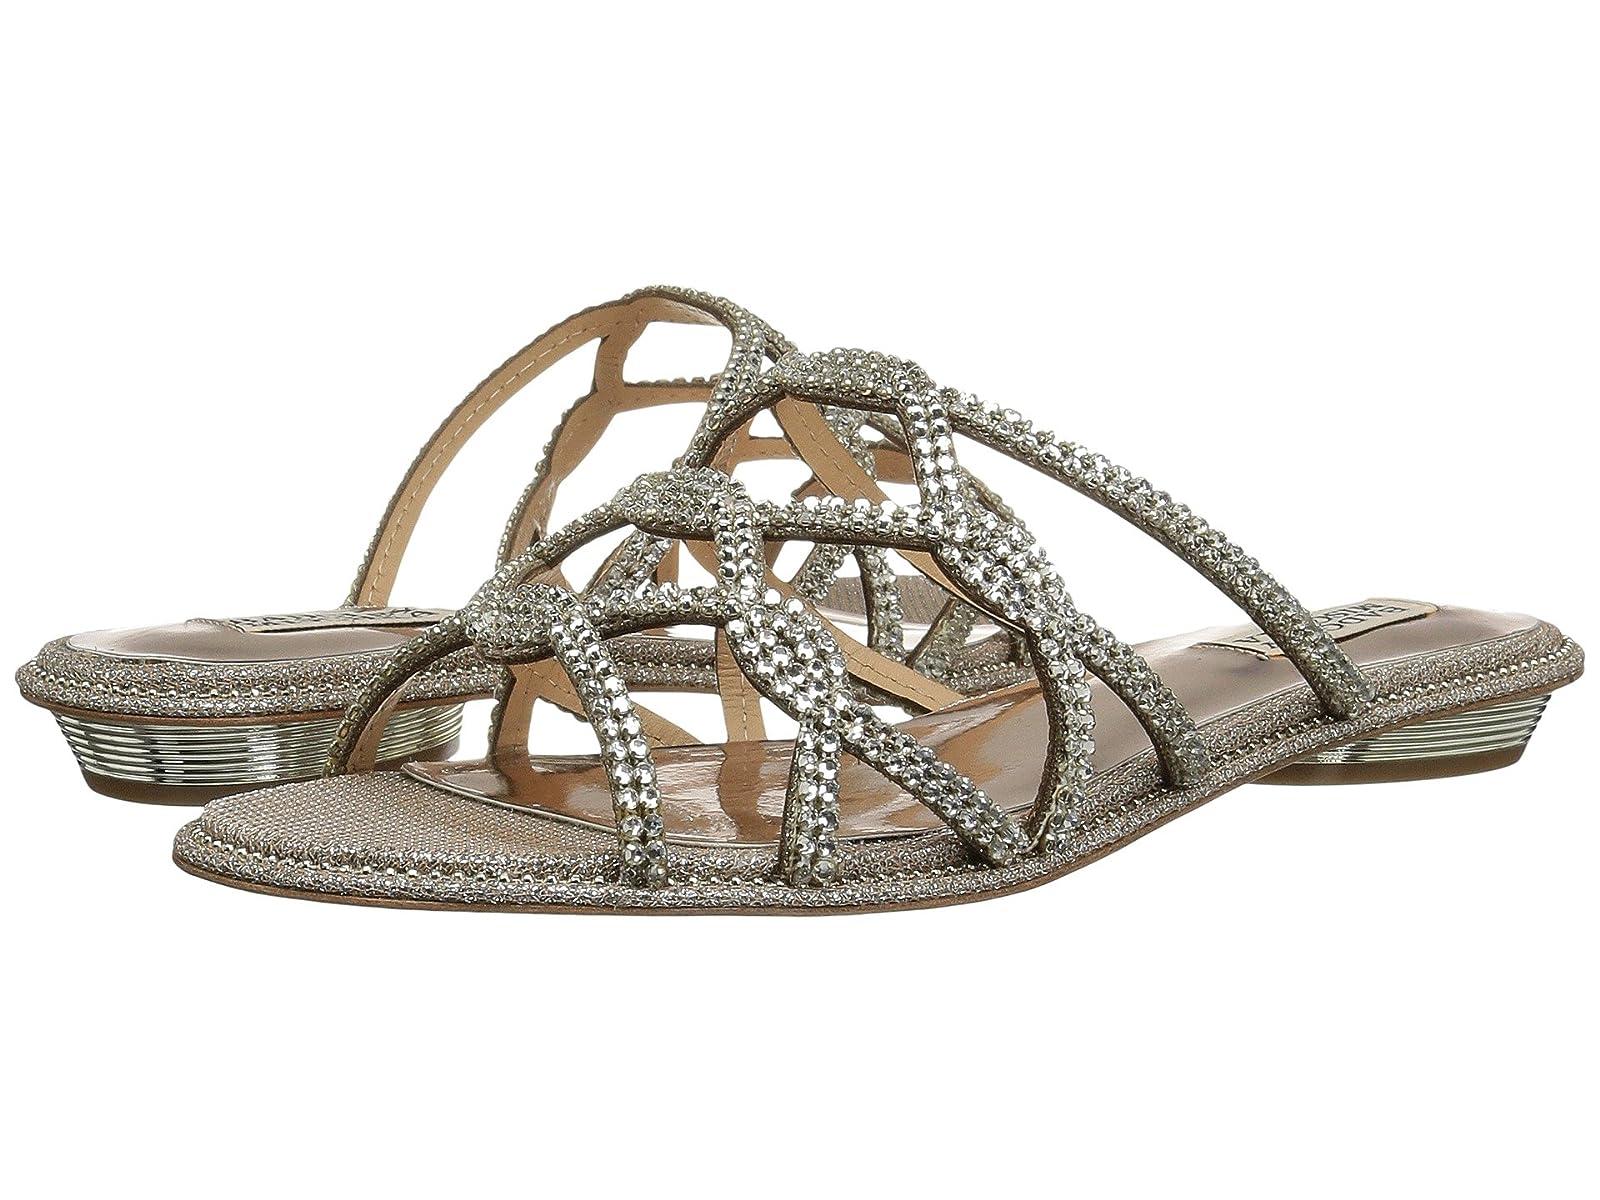 Badgley Mischka SofieCheap and distinctive eye-catching shoes